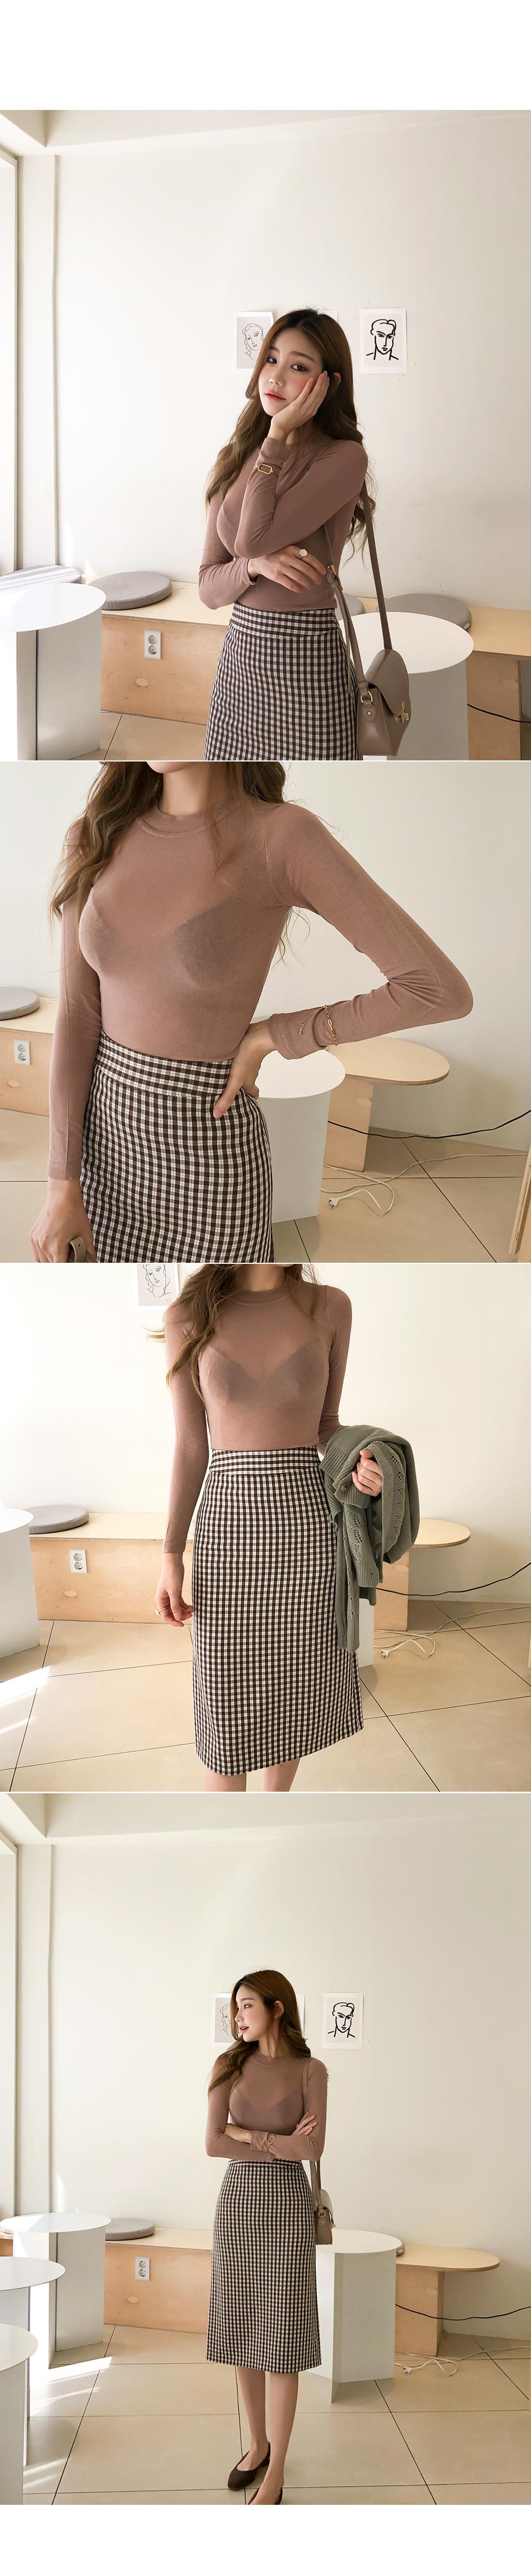 Pretty color check skirt